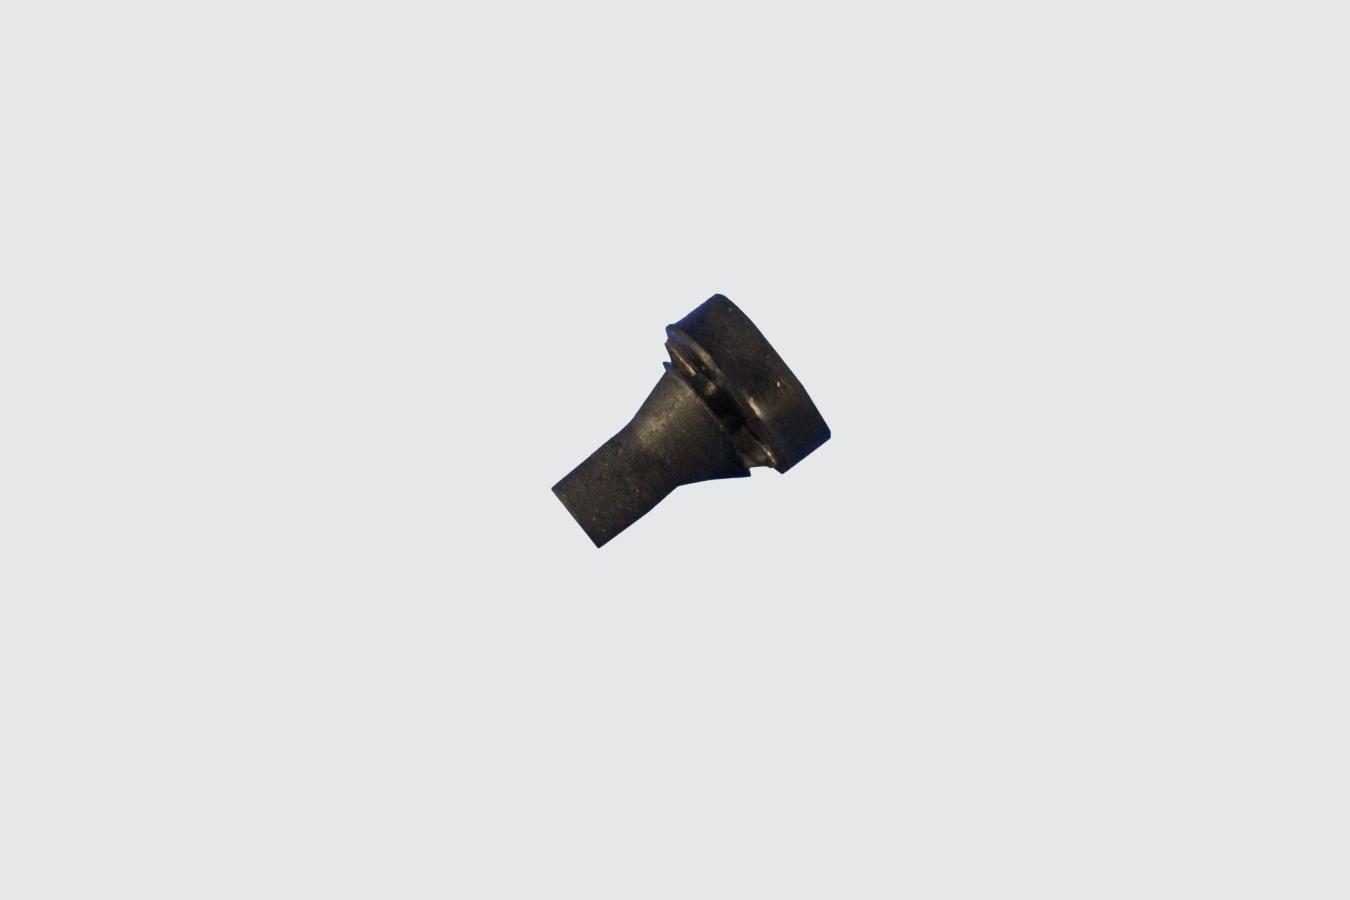 36865293-BUMPER, RUBBER